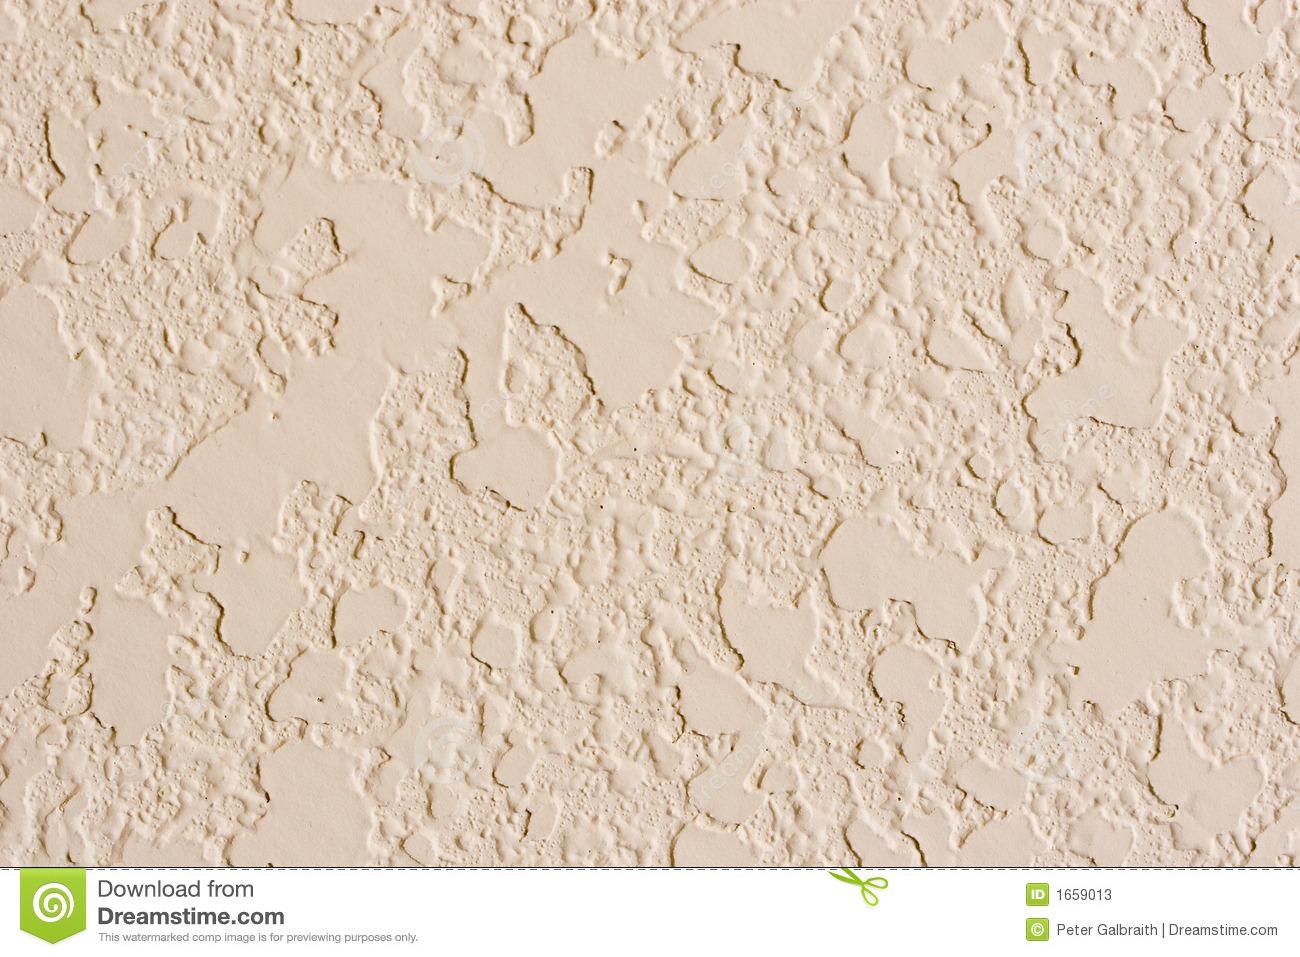 Textura para parede diferente descubra como é Revista das  #84A724 1300 957